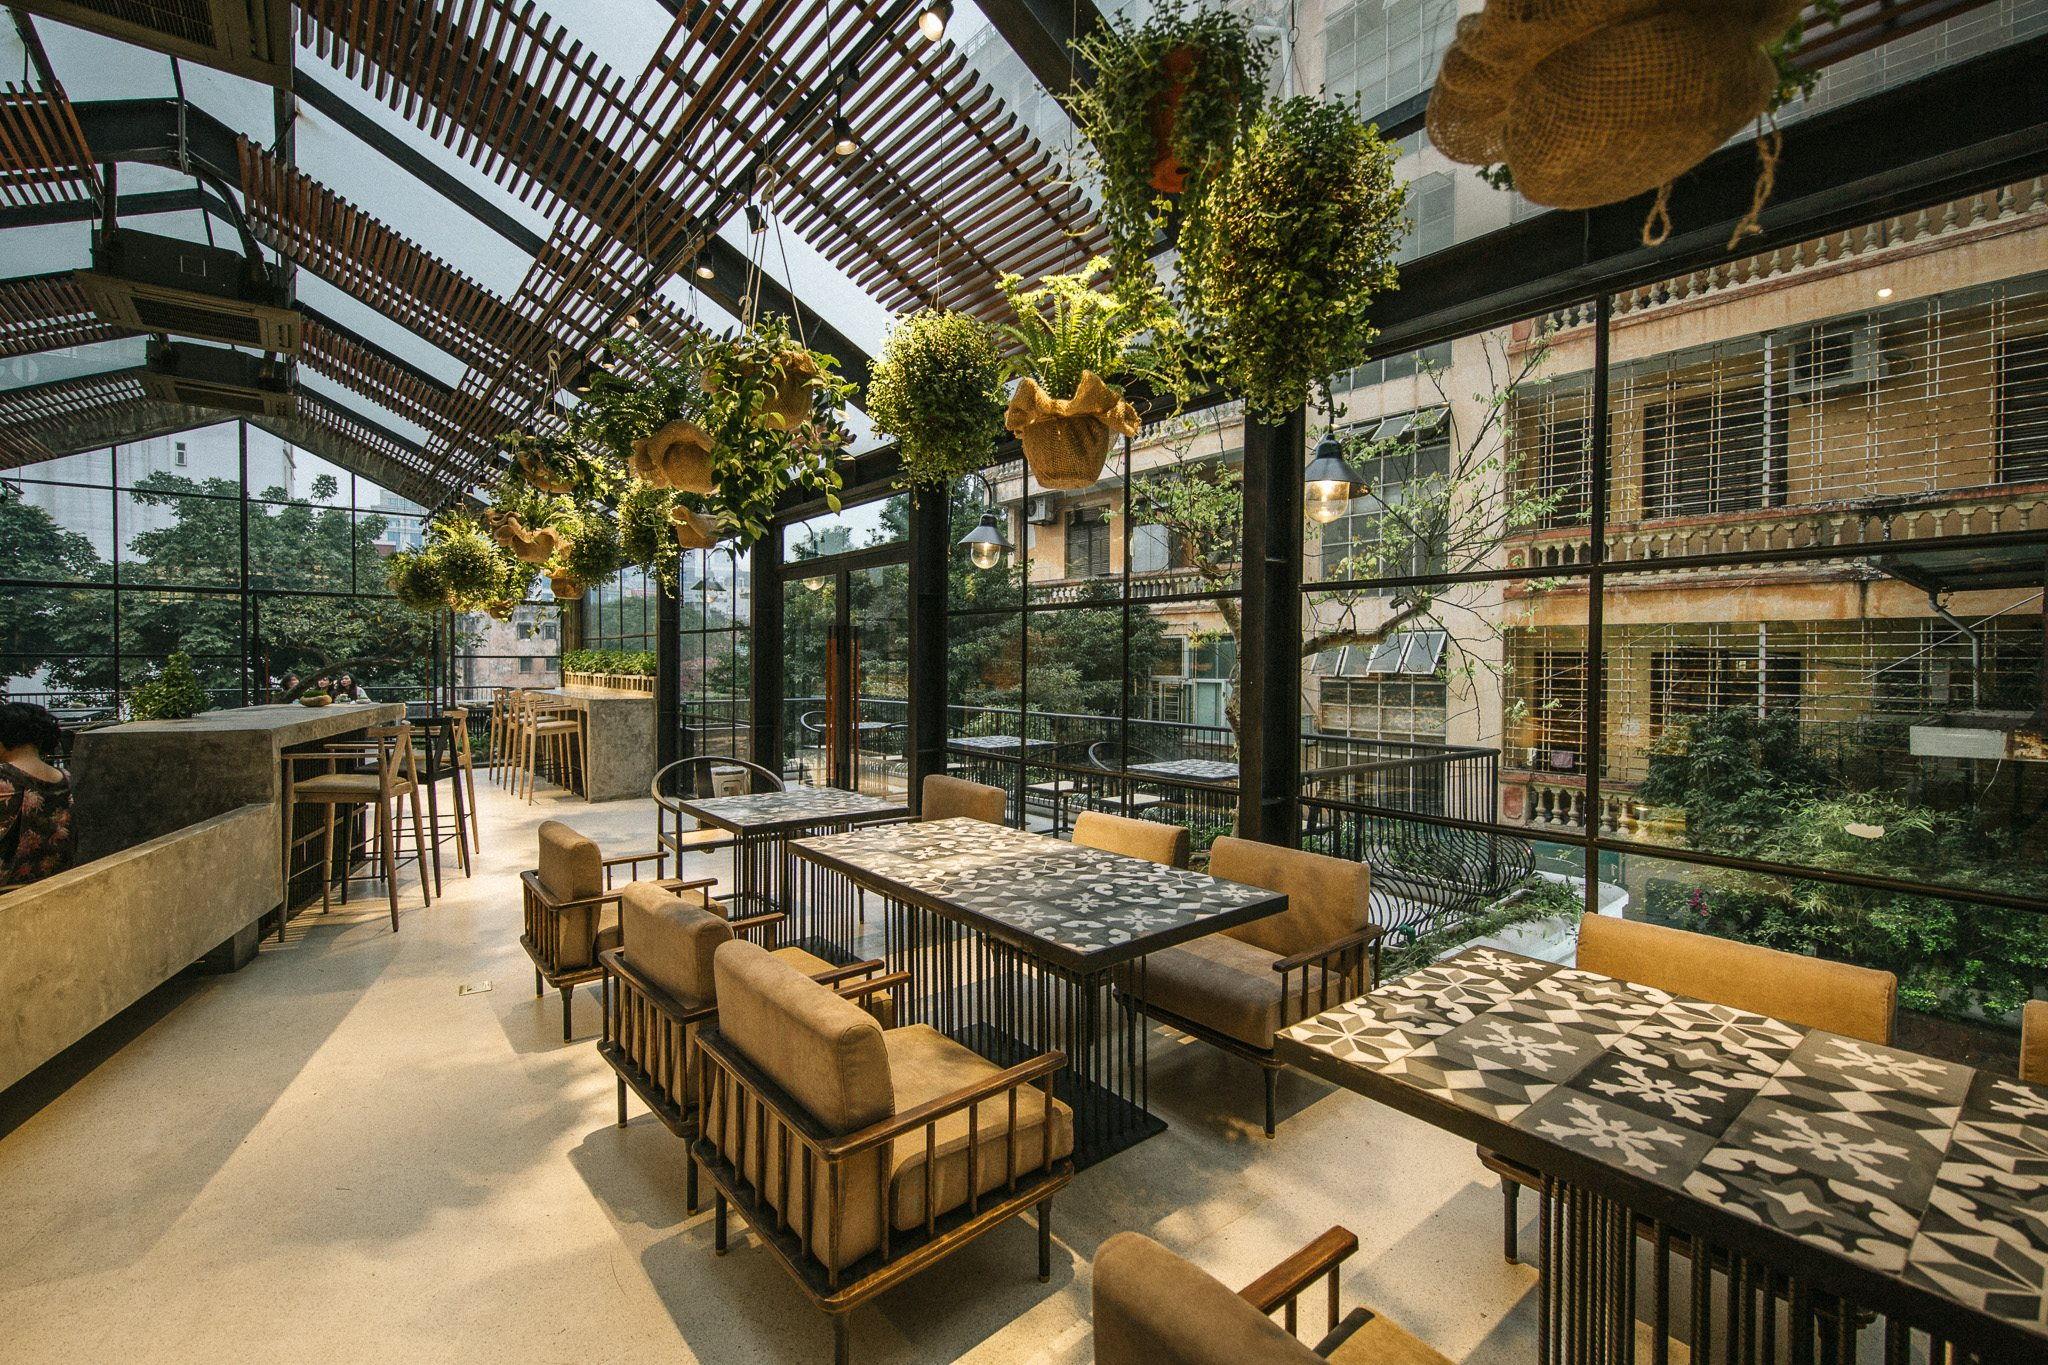 hanoi vegetarian restaurant uu dam chay greenhouse top floor